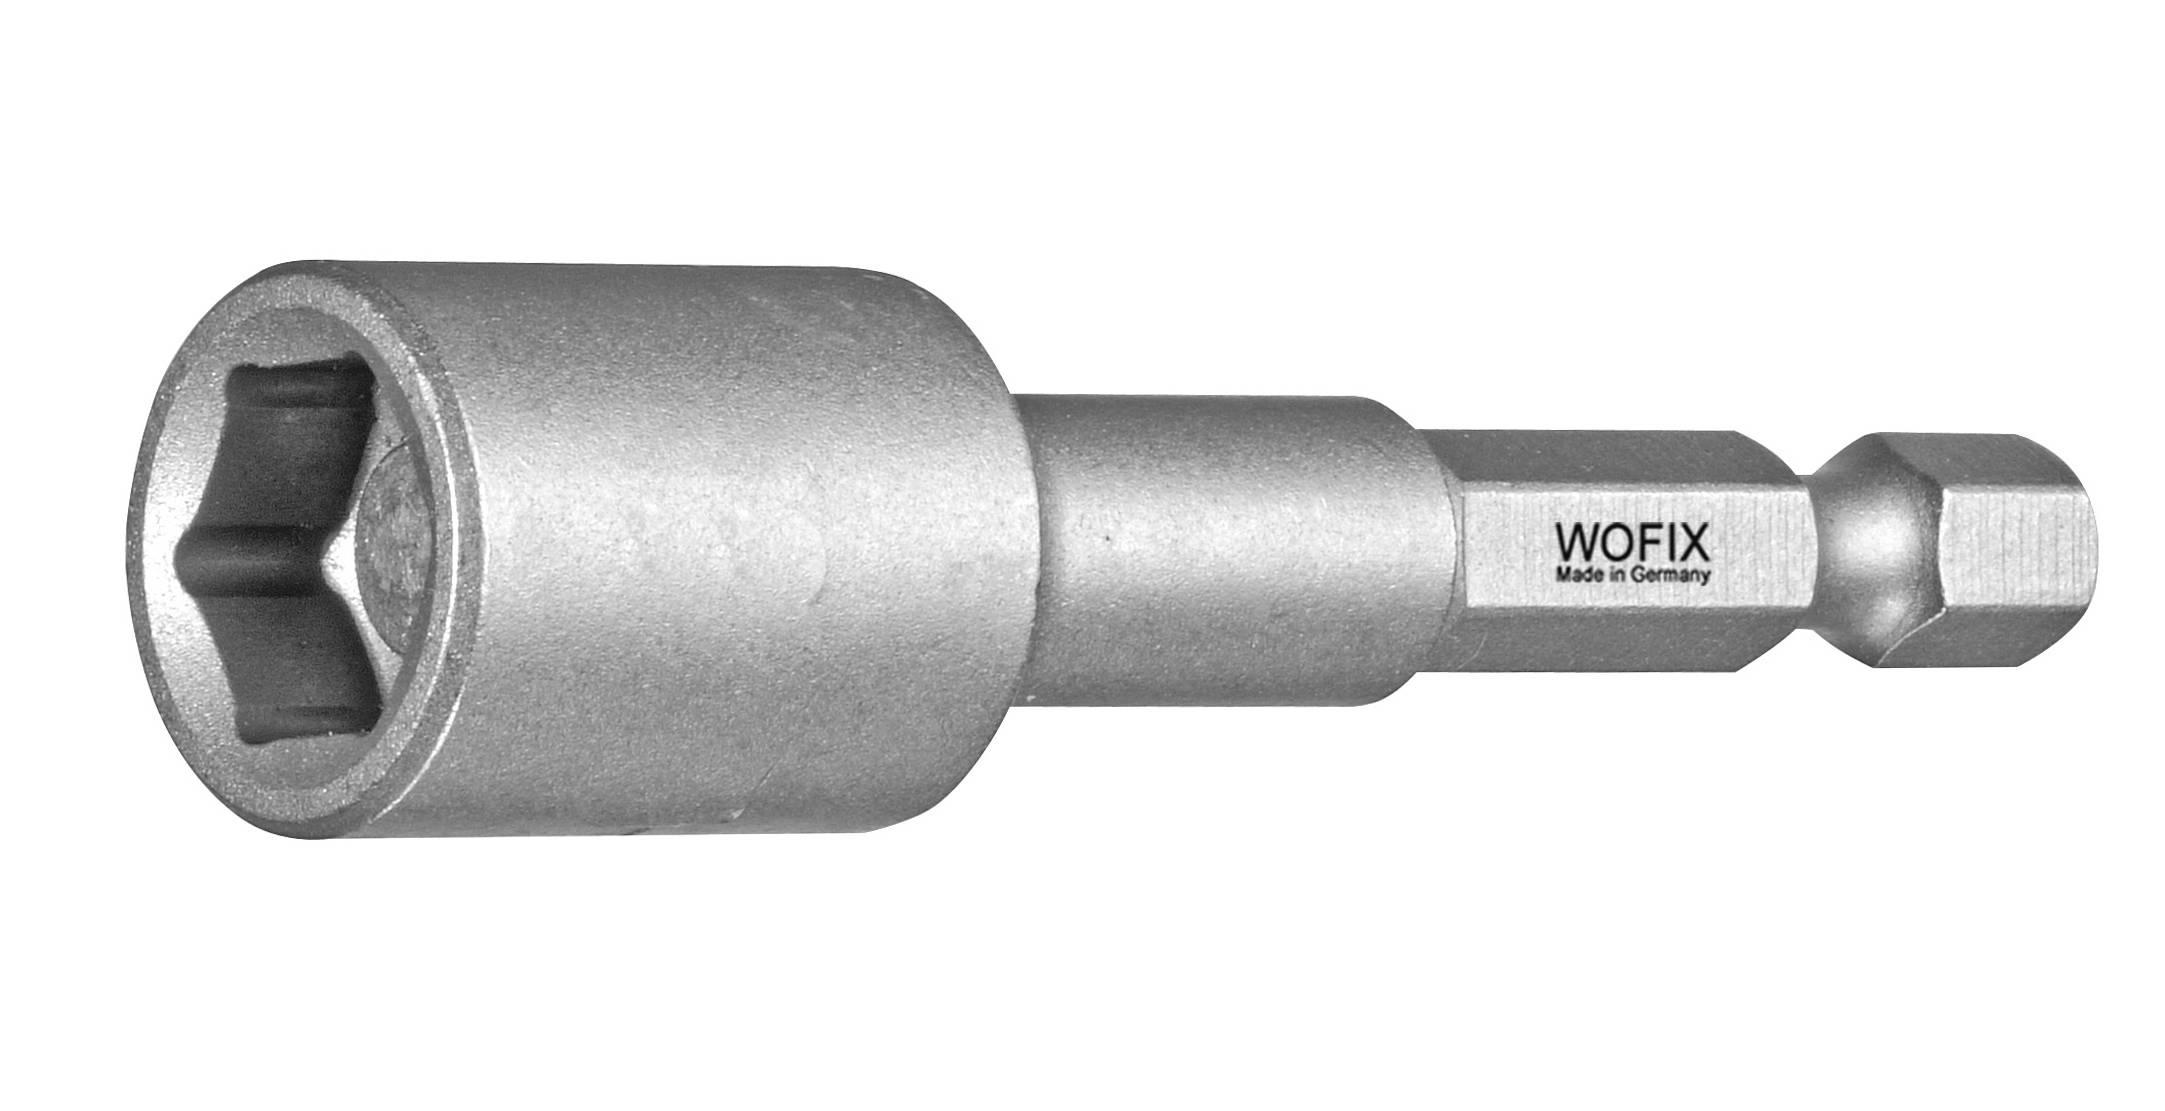 Wofix 7358516 Professional standard Dopbit - SW5/16 50 mm